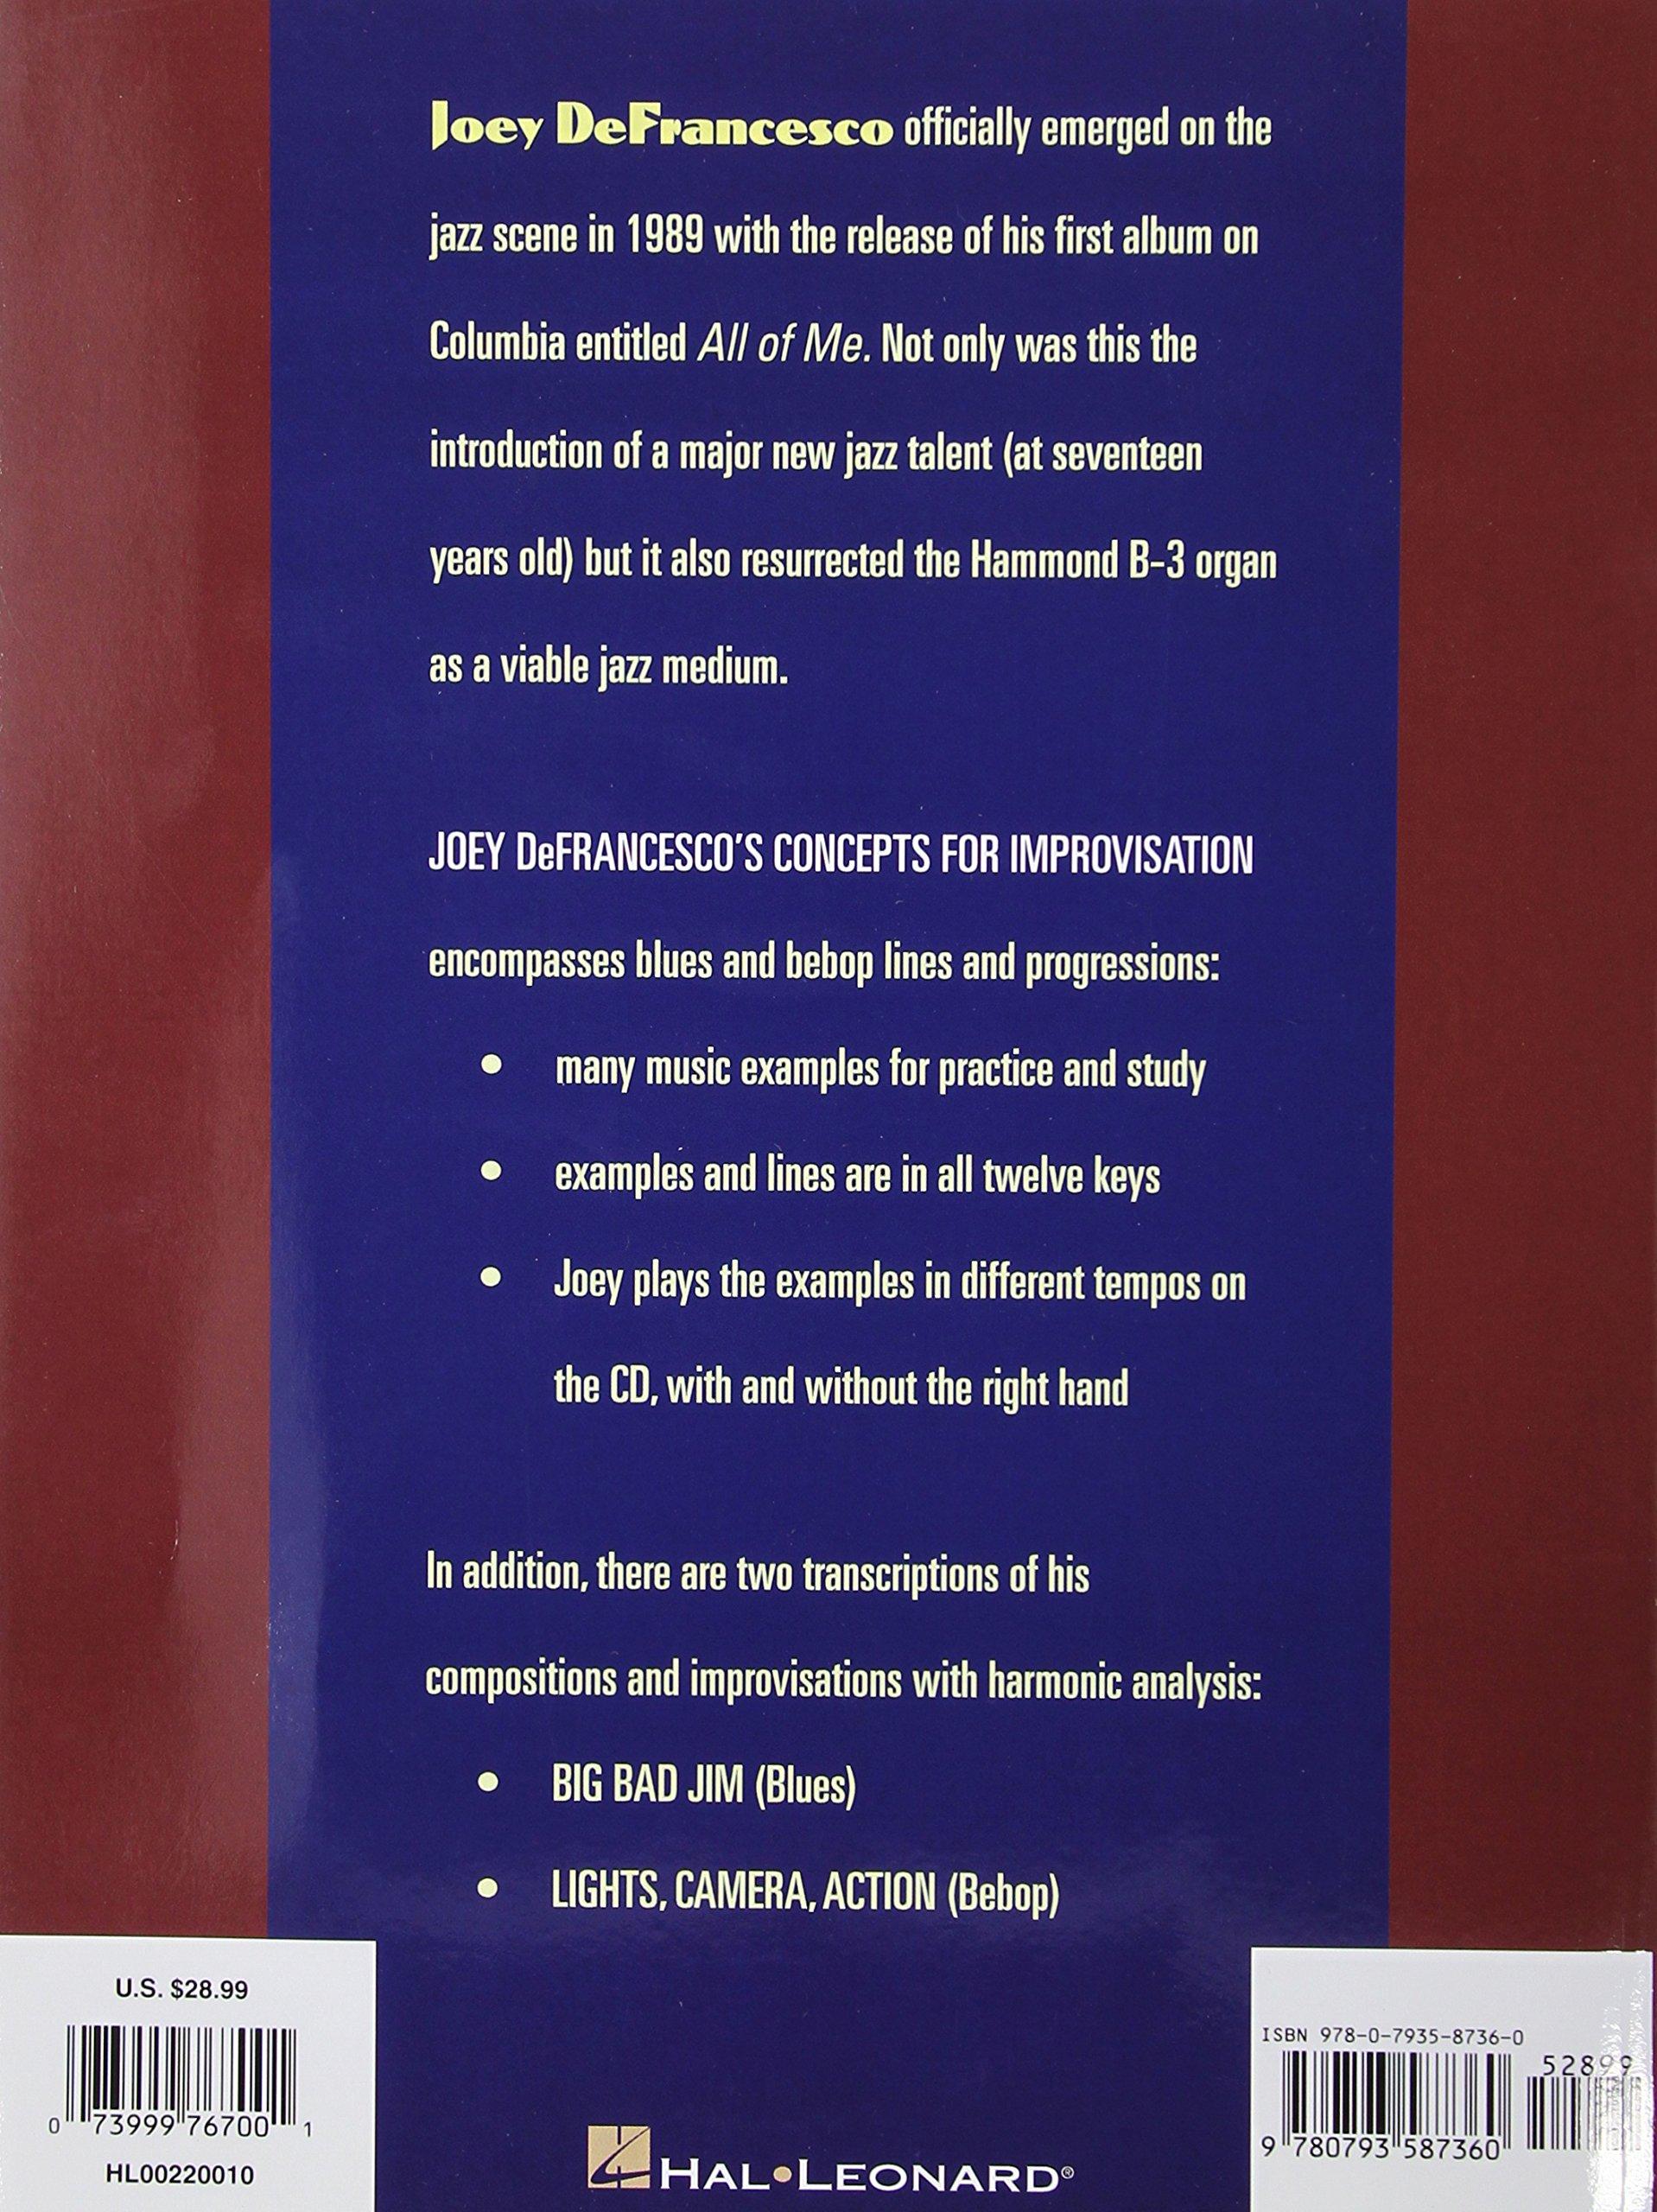 Joey defrancescos concepts for improvisation joey defrancesco joey defrancescos concepts for improvisation joey defrancesco 0073999767001 amazon books fandeluxe Gallery